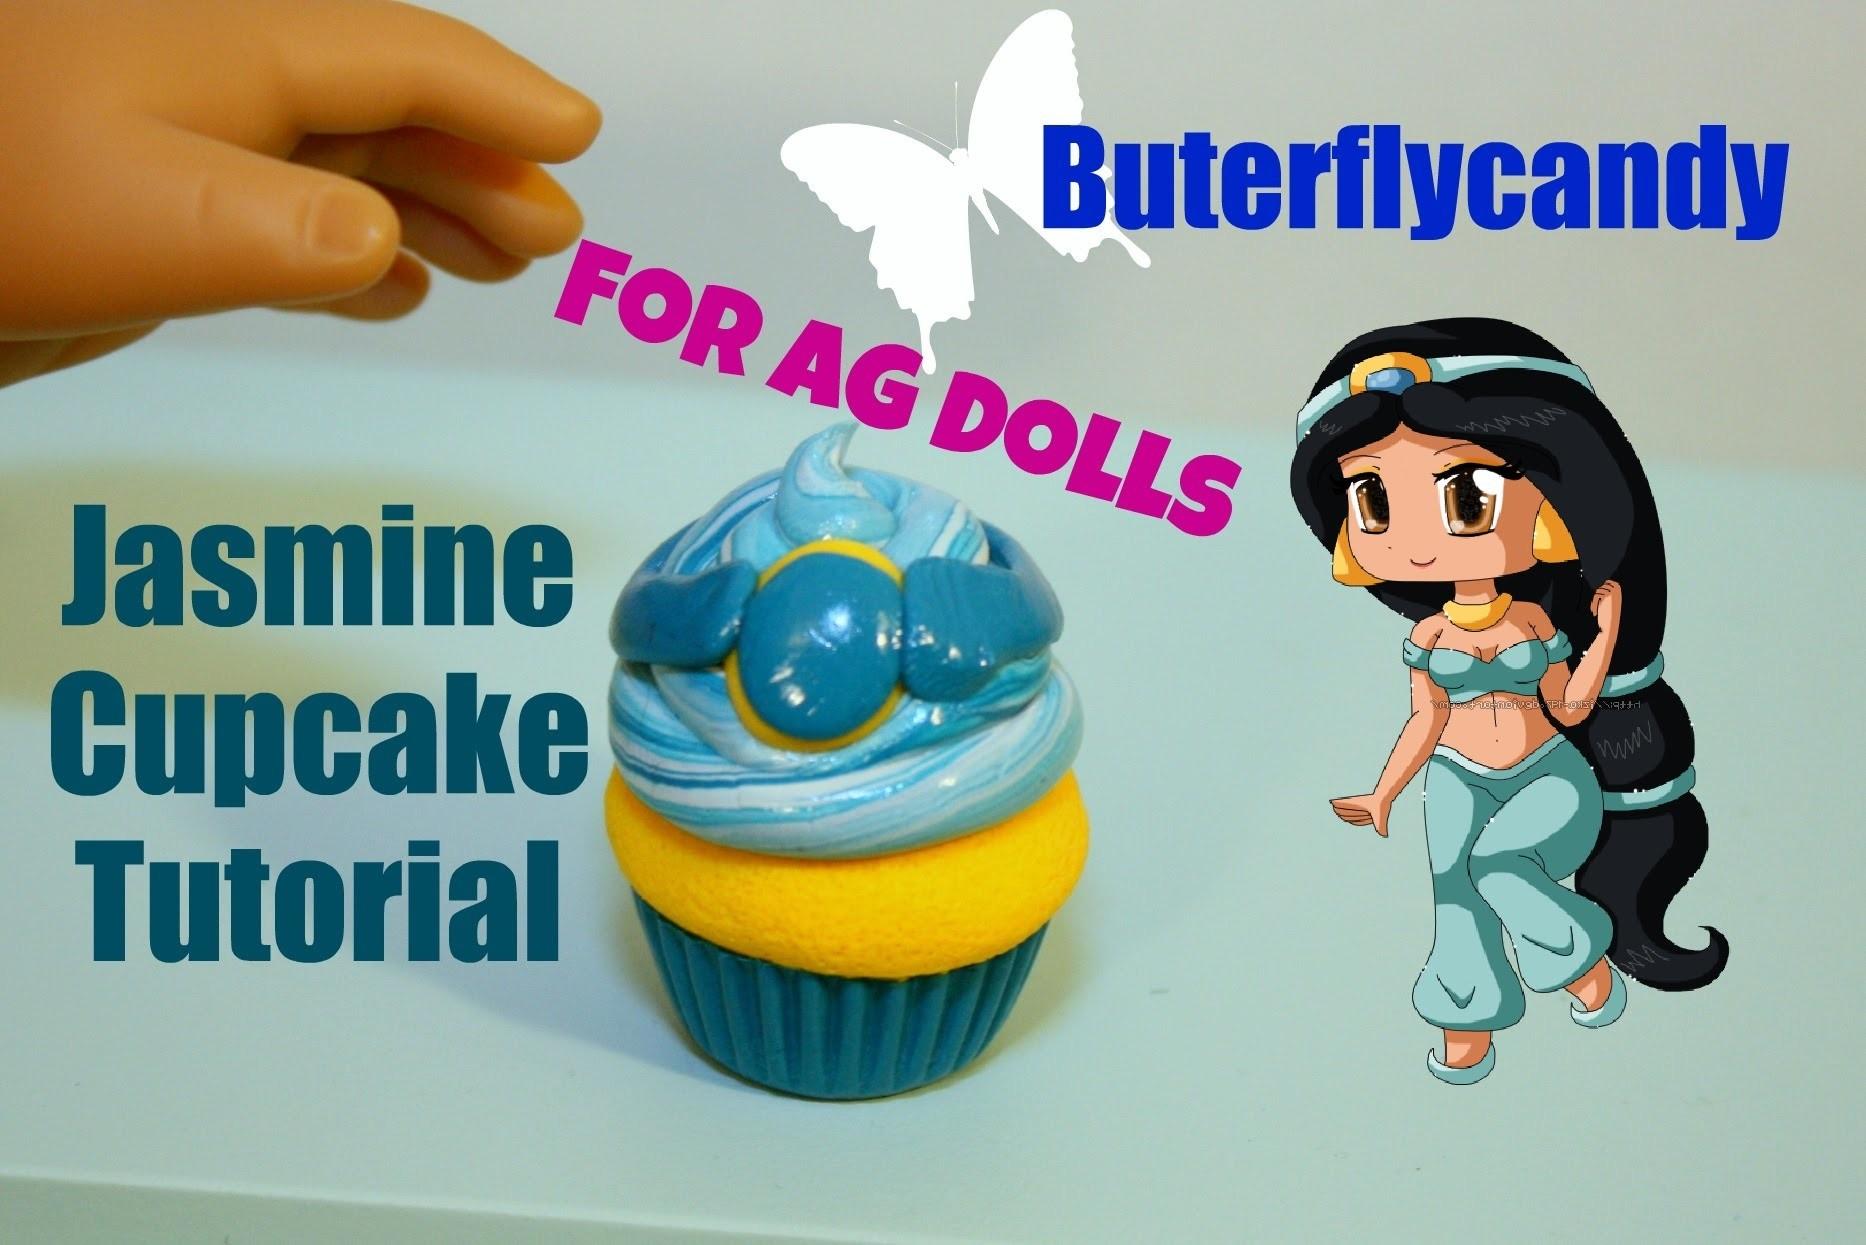 Princess Jasmine Cupcakes | American Girl Food Tutorial | Dessert | Cake | Polymer Clay